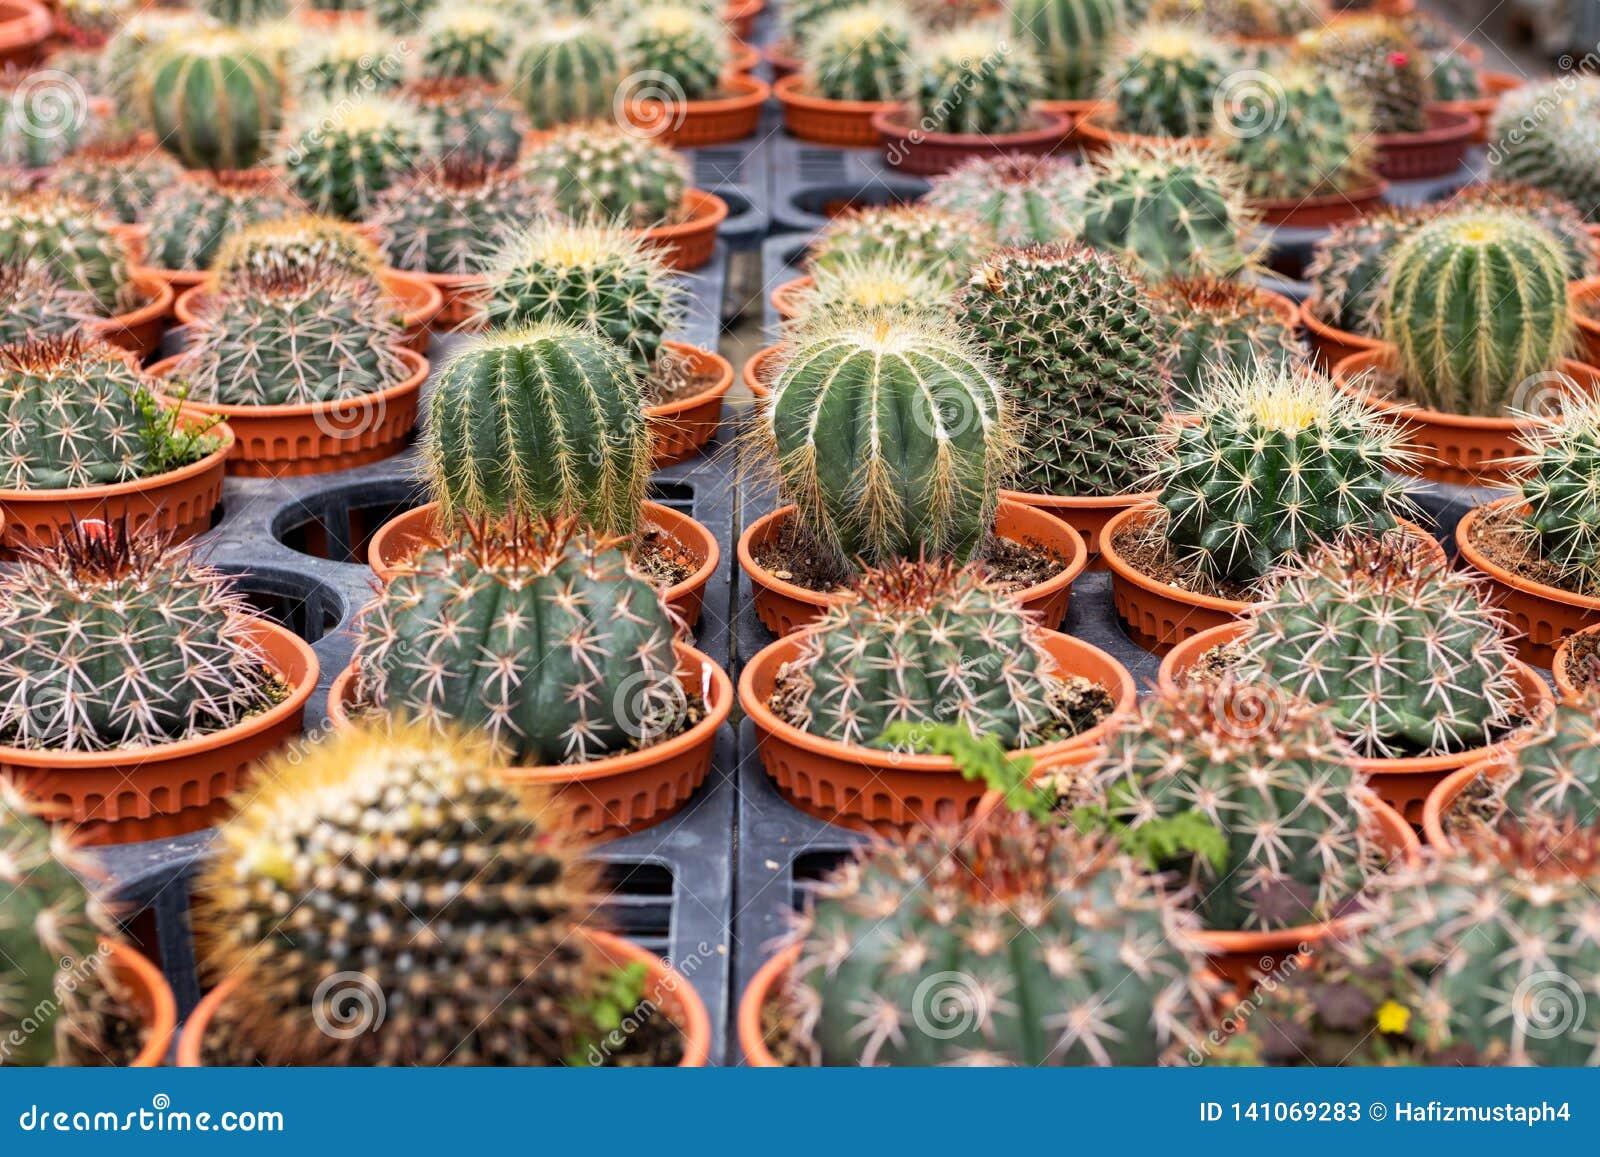 Variedades de planta do cacto no potenciômetro Feche acima da vista Foco seletivo